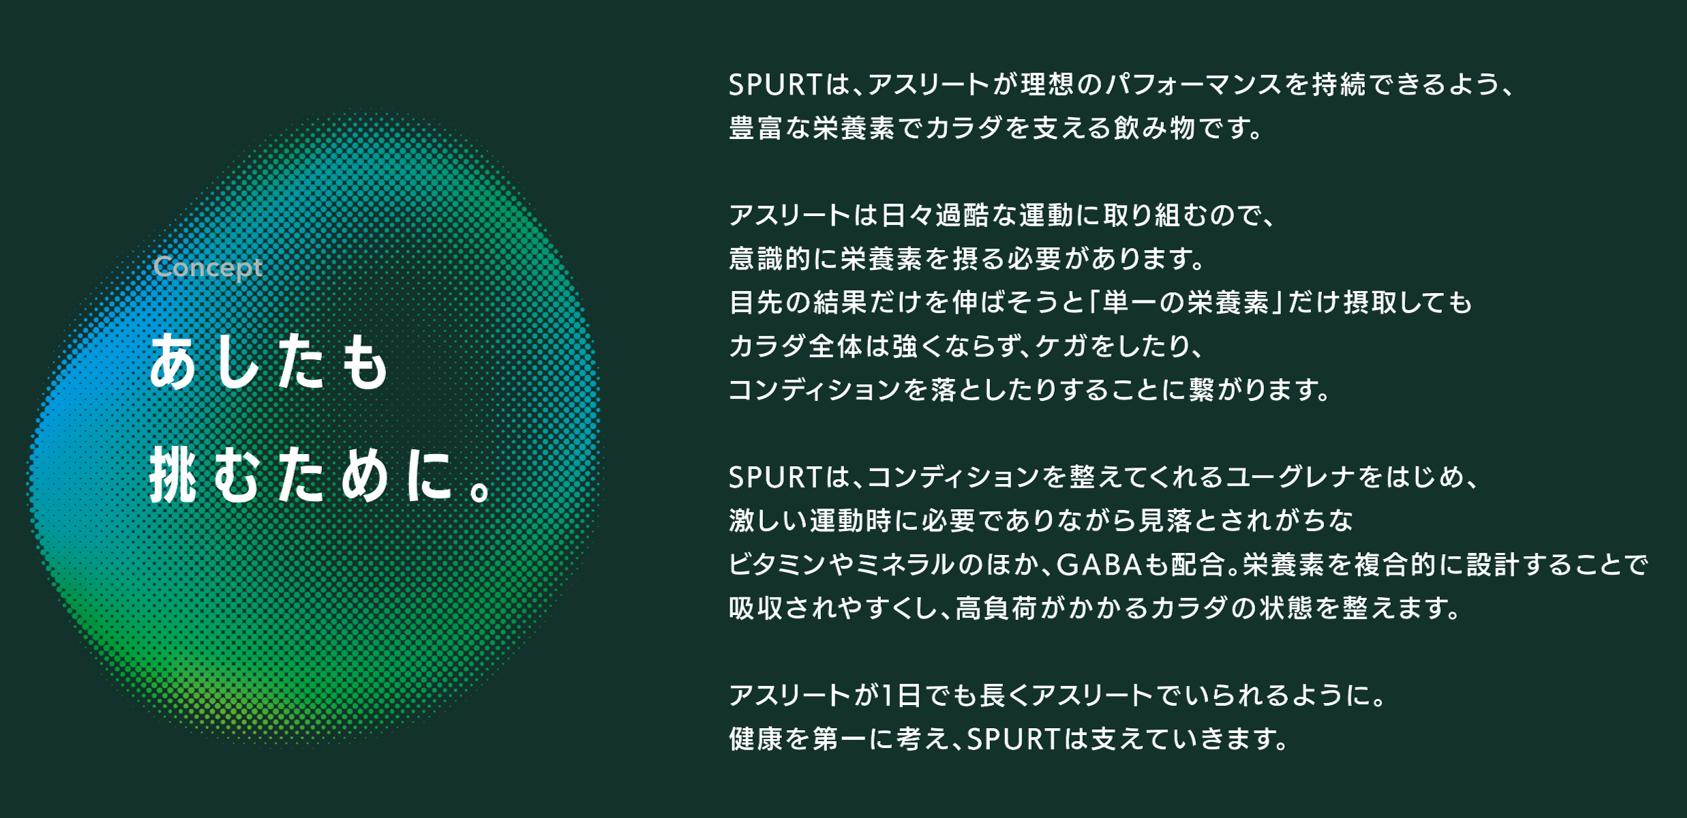 SPURT_ブランドコンセプト